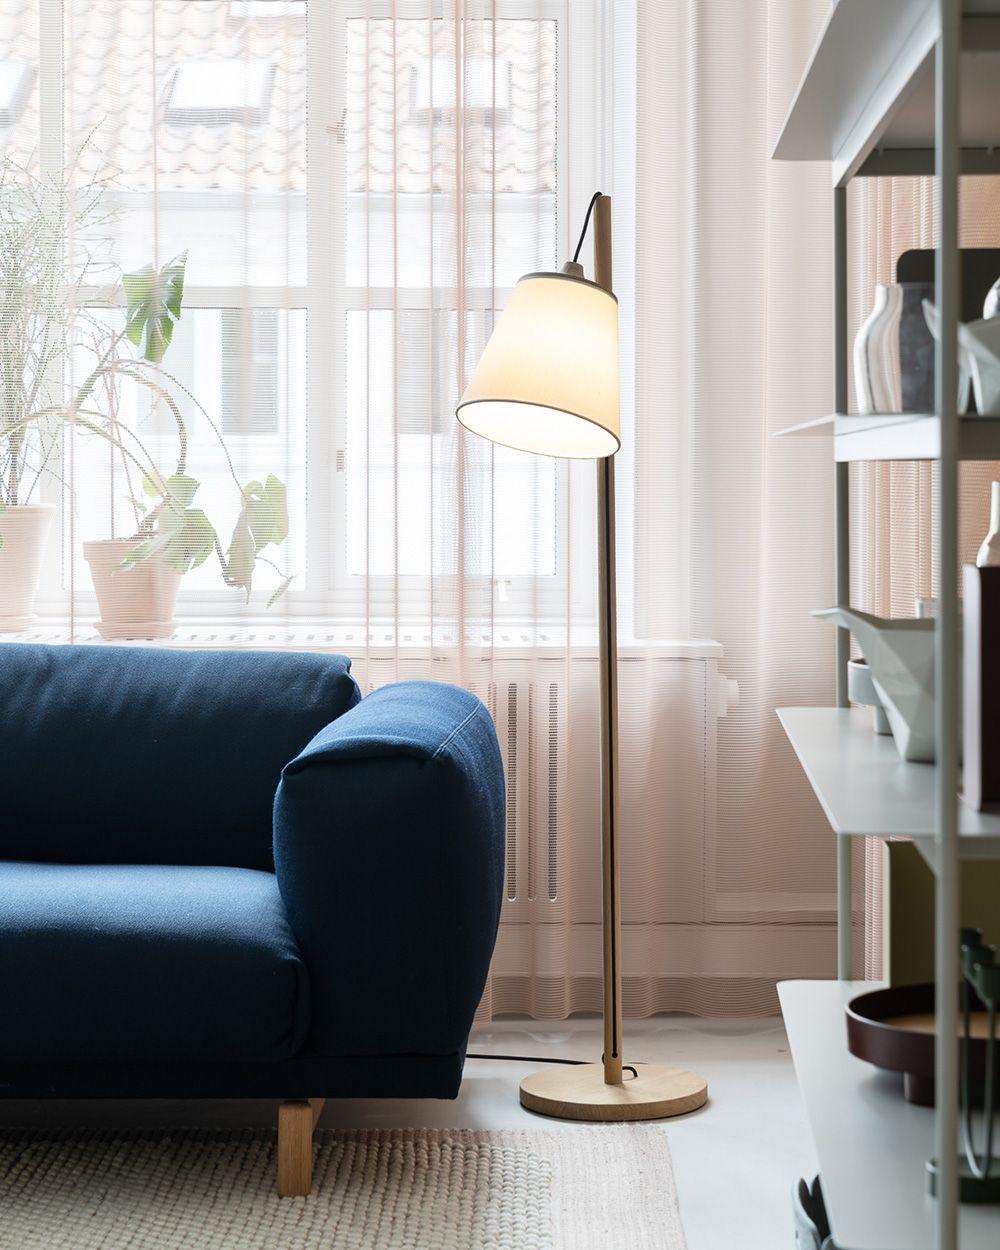 Scandinavian Interior Inspiration From Muuto Taking Cues From Scandinavian Design With Playful App Floor Lamps Living Room Home Decor Living Room Scandinavian